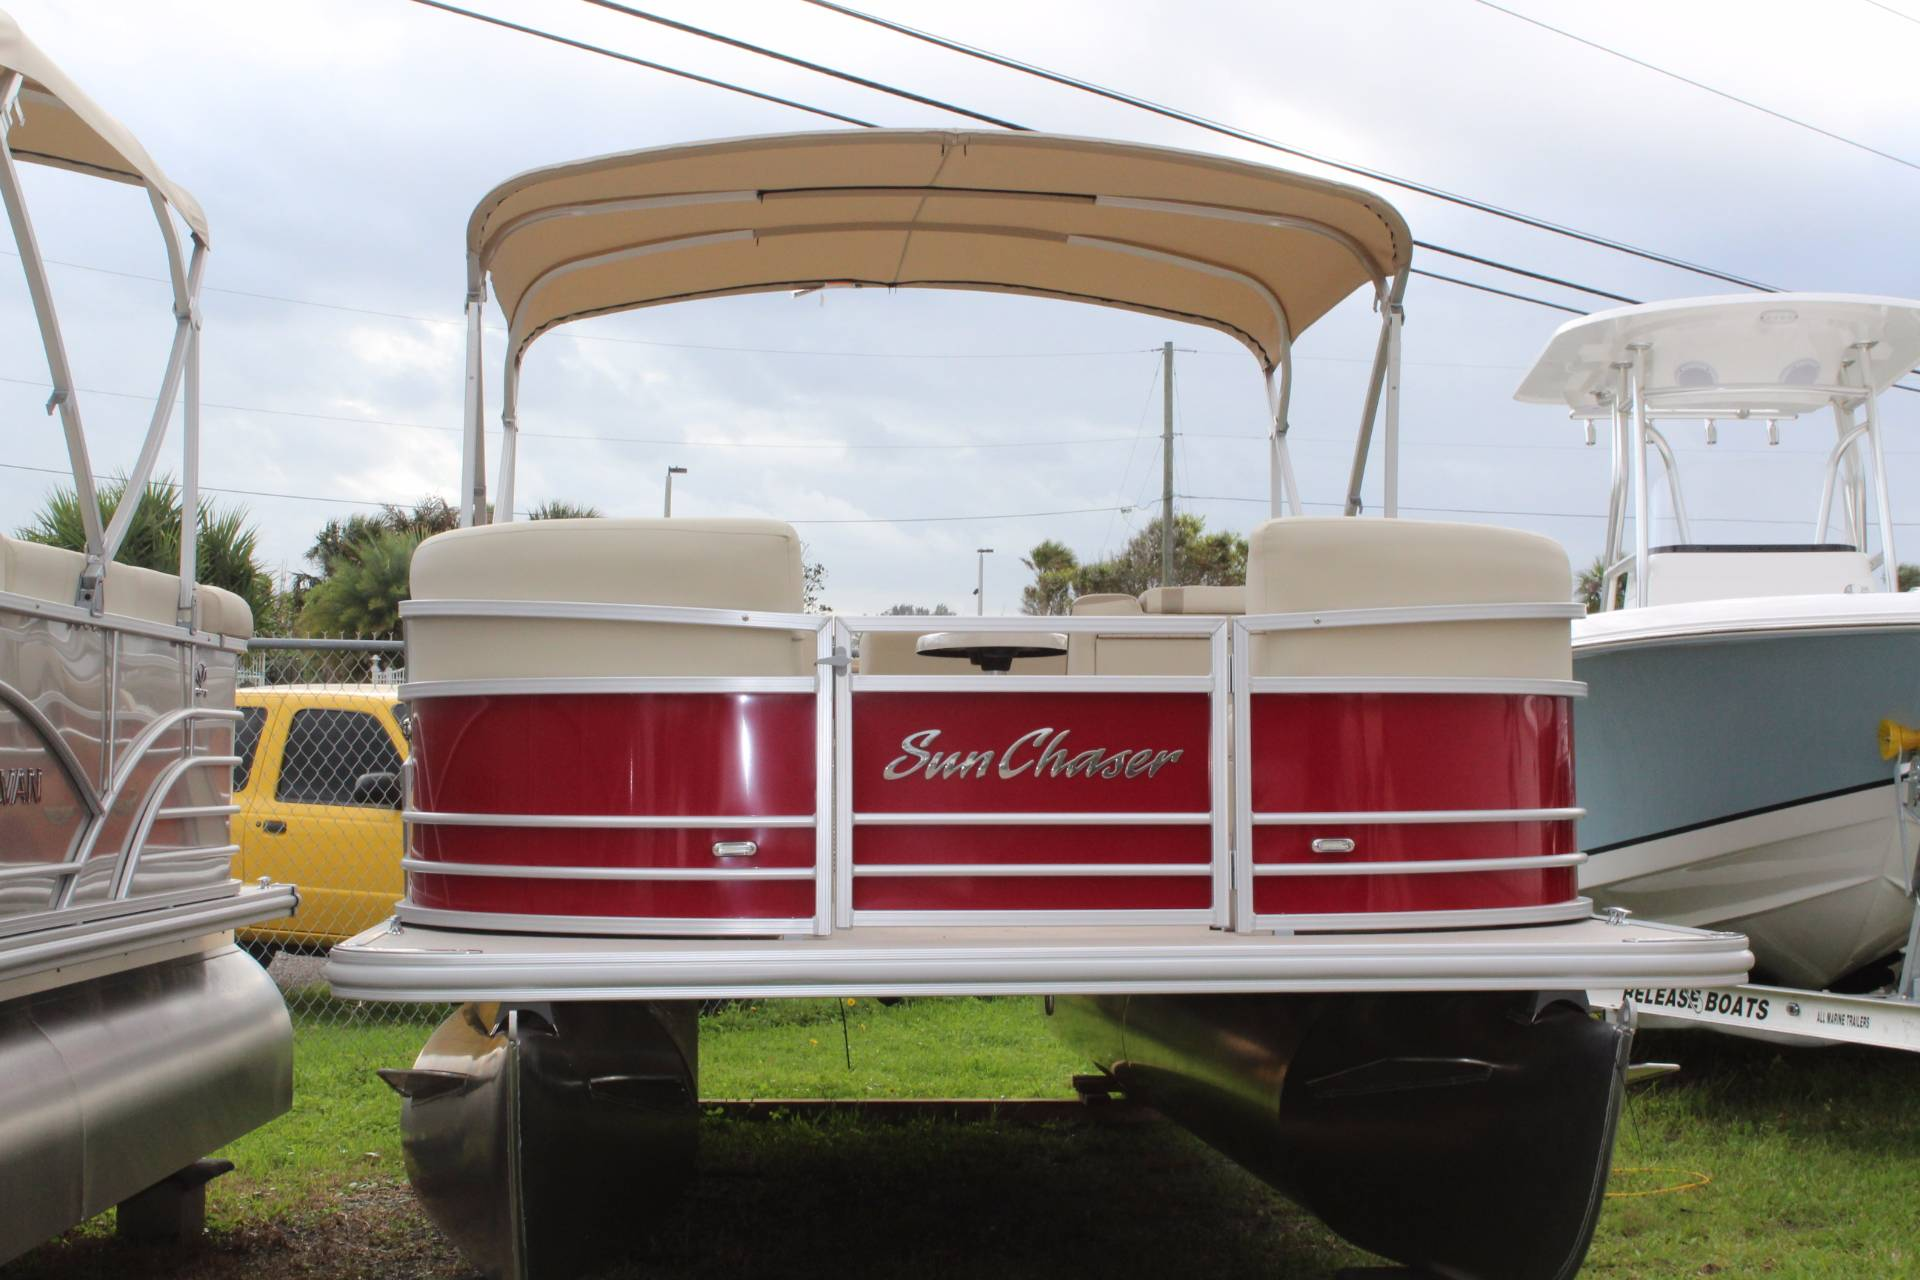 SunChaser 8522 Cruise-N-Fish